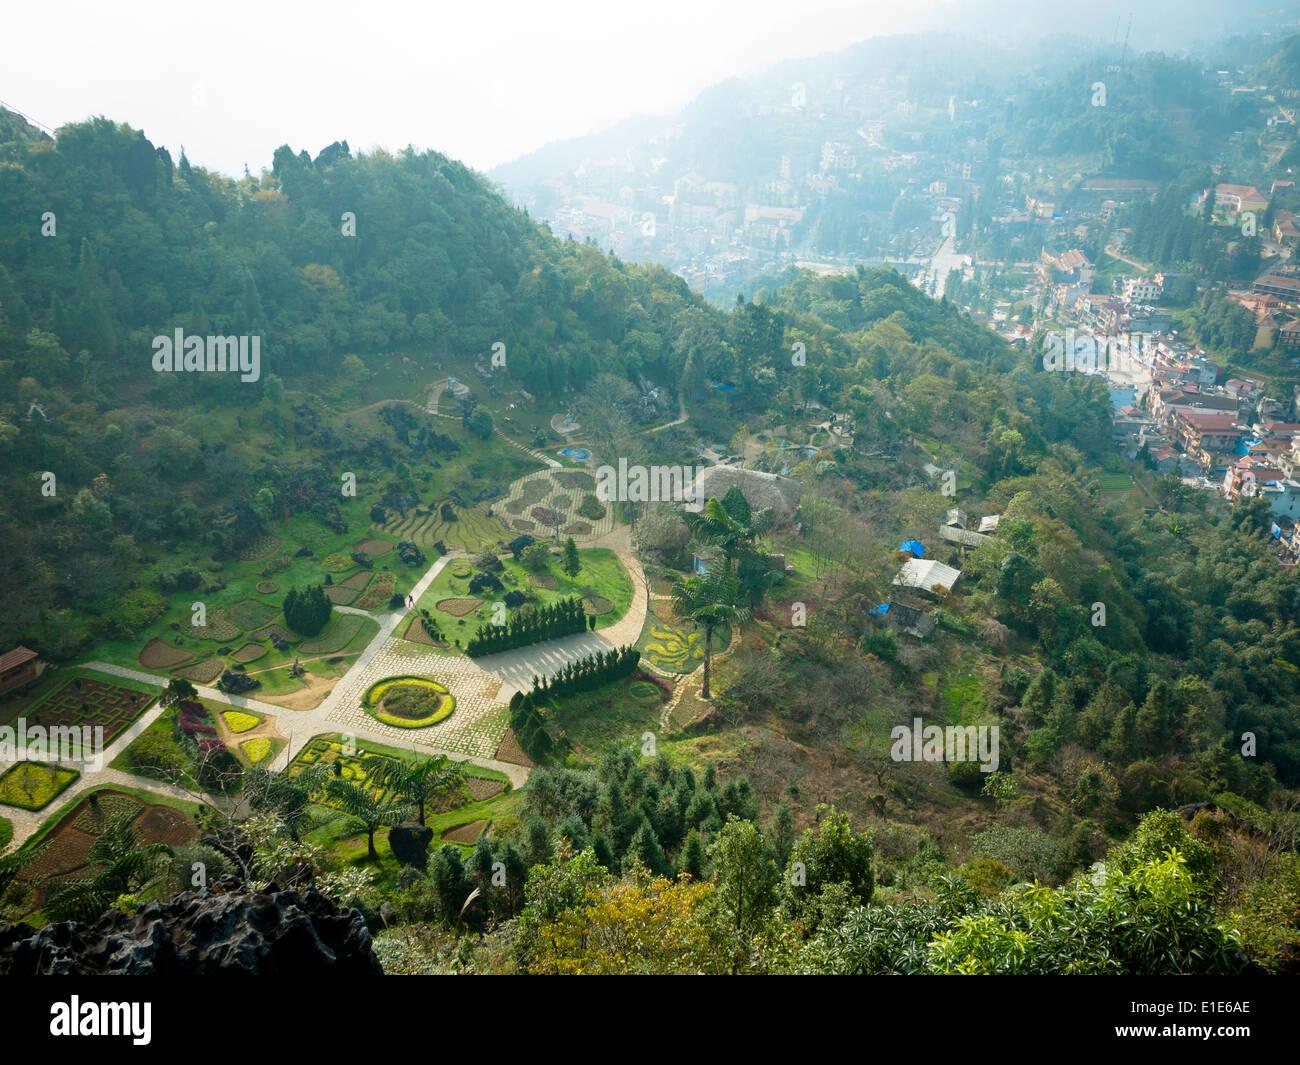 A view of Sapa (Sa Pa), Vietnam, as seen from Vuon Hoa Ham Rong (Vuon Hoa Botanical Gardens). - Stock Image